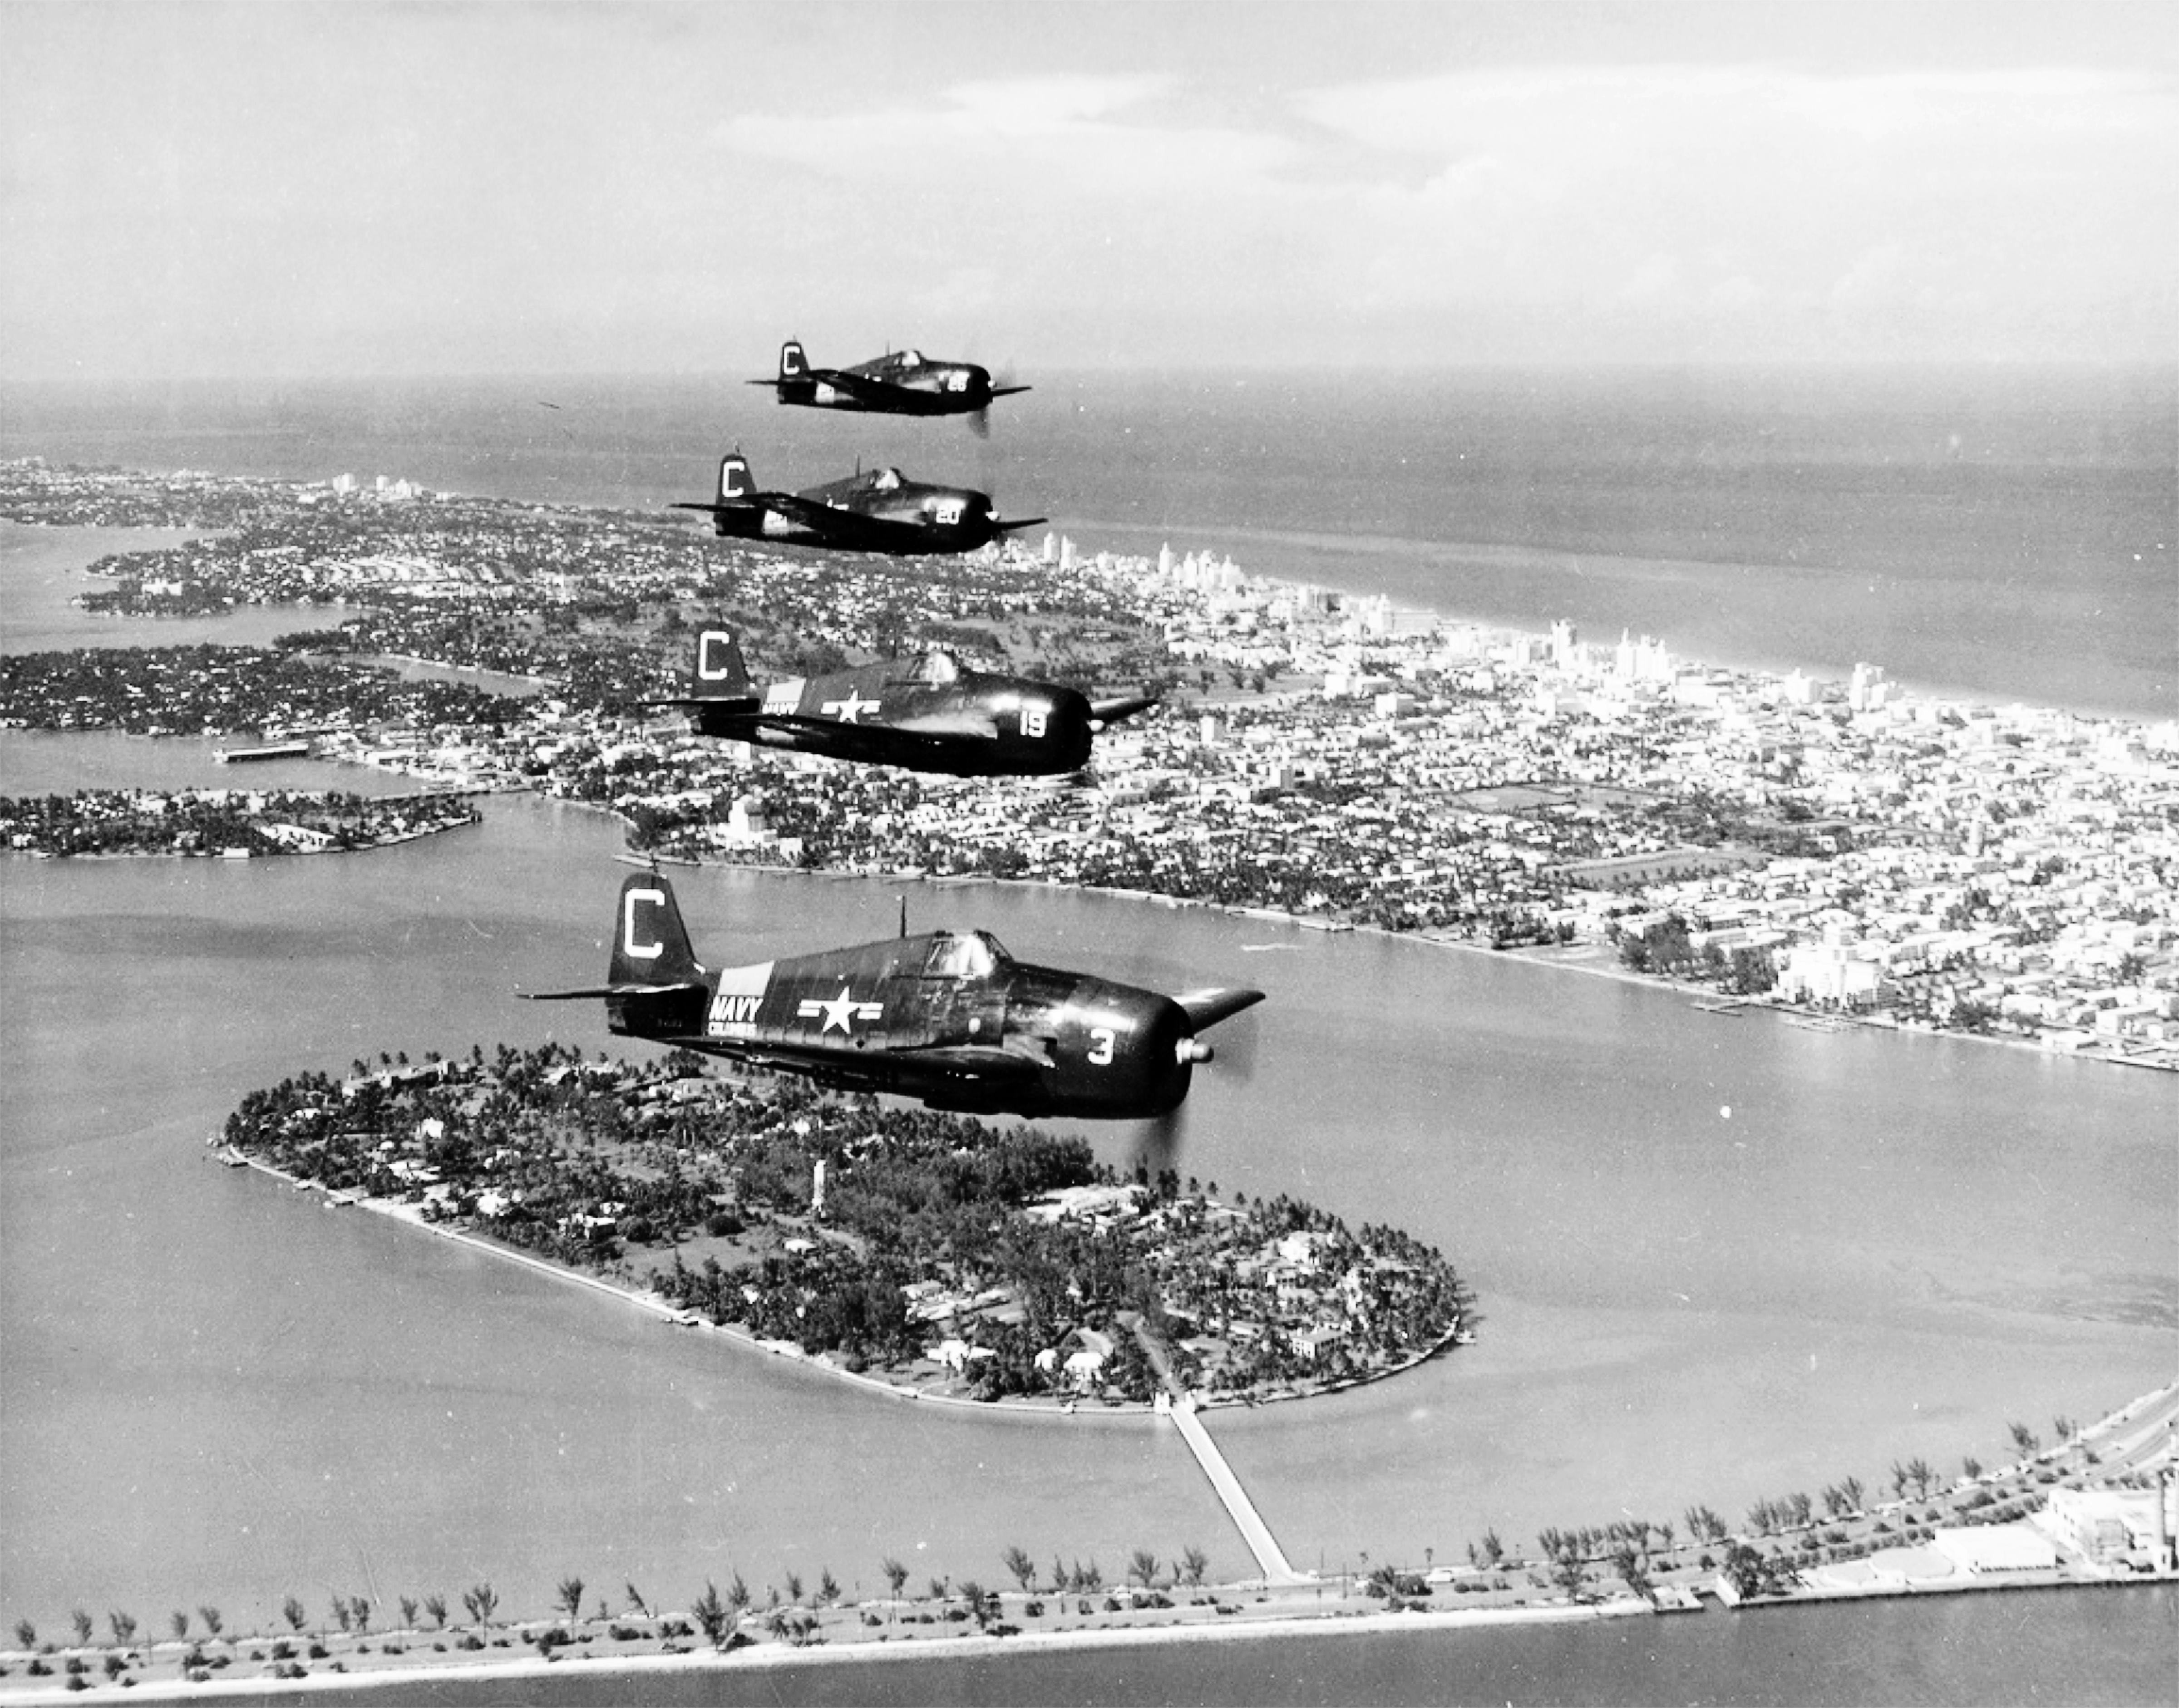 Grumman F6F 5P Hellcat NARTU White C3 BuNo 72386 C19 C20 and C26 over Miami NARTU Columbus OH 1950 03